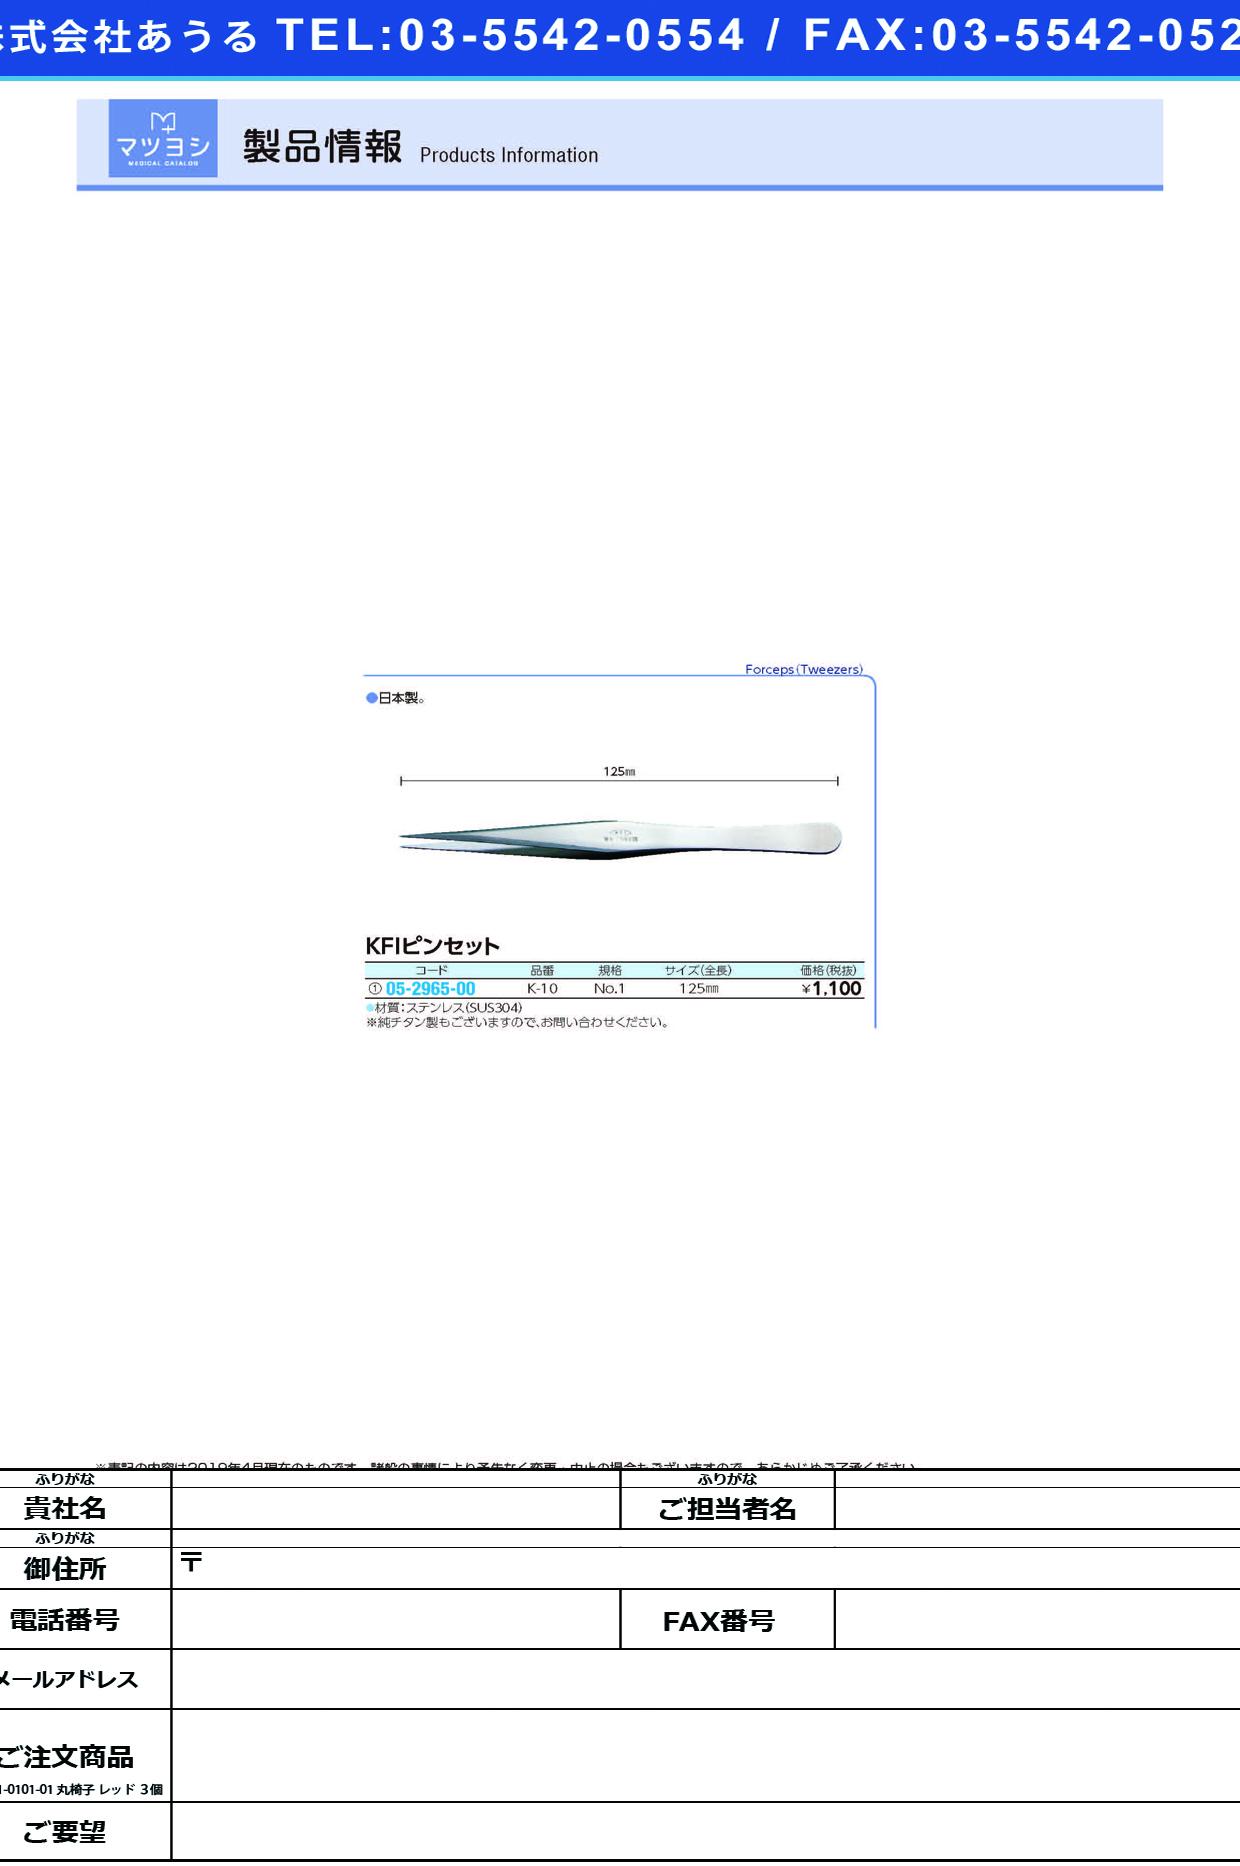 (05-2965-00)KFIピンセットNo.1 K-10(ステンレス)125MM ピンセット【1本単位】【2019年カタログ商品】